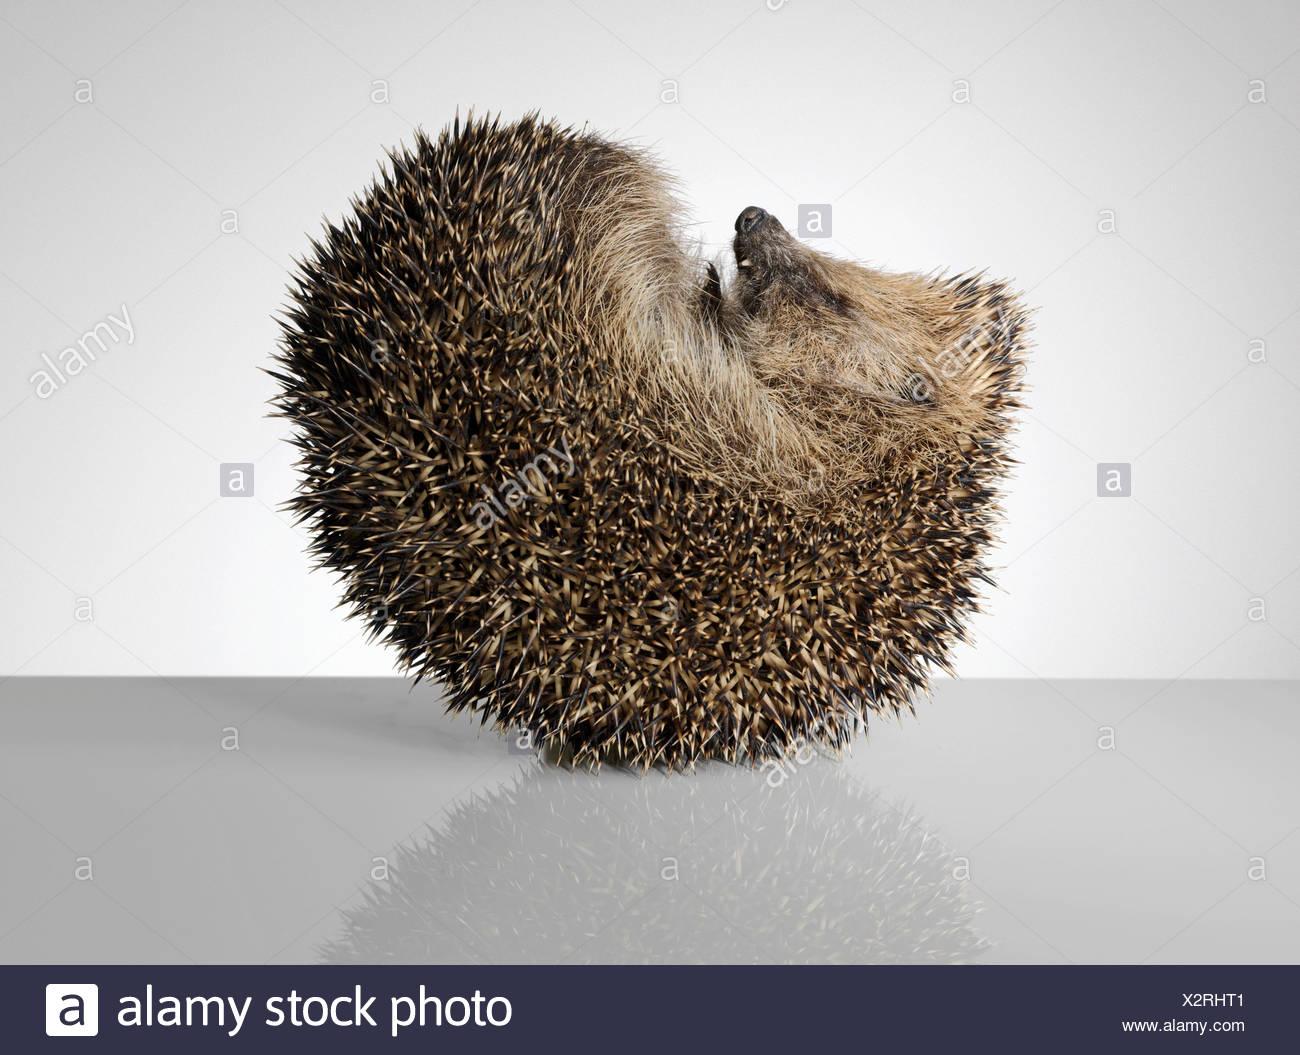 Hedgehog, curled up - Stock Image